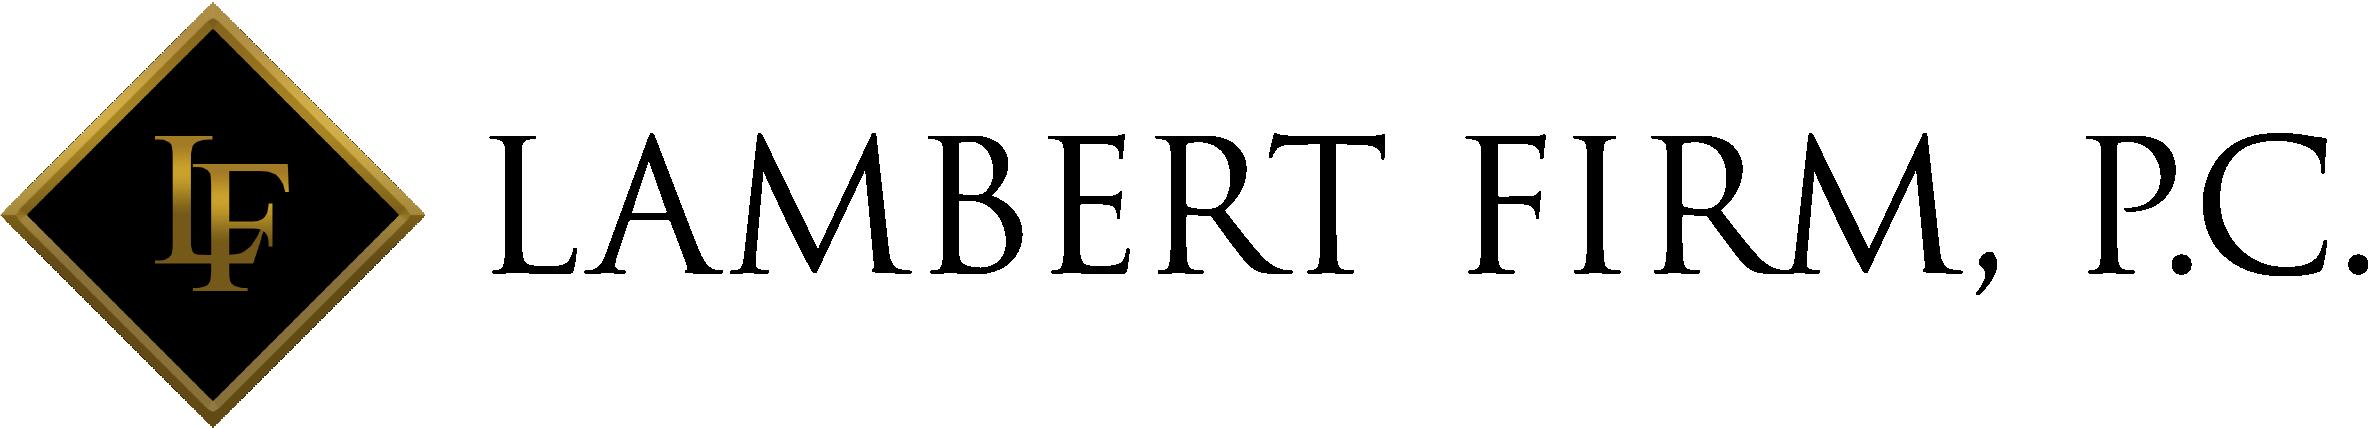 Lambert Firm, P.C. Logo